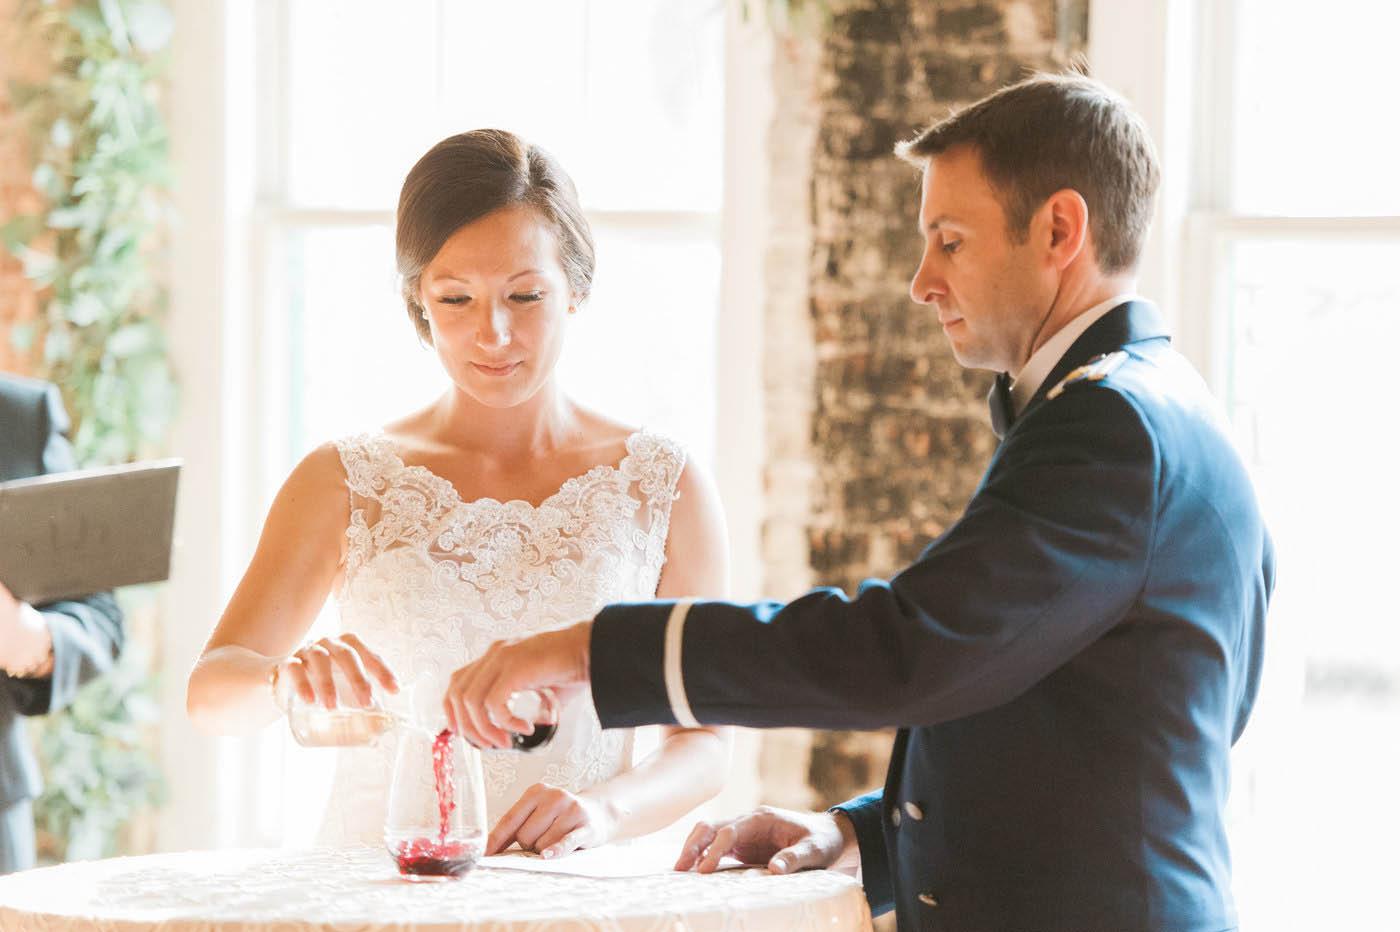 Wine uniting ceremony at wedding